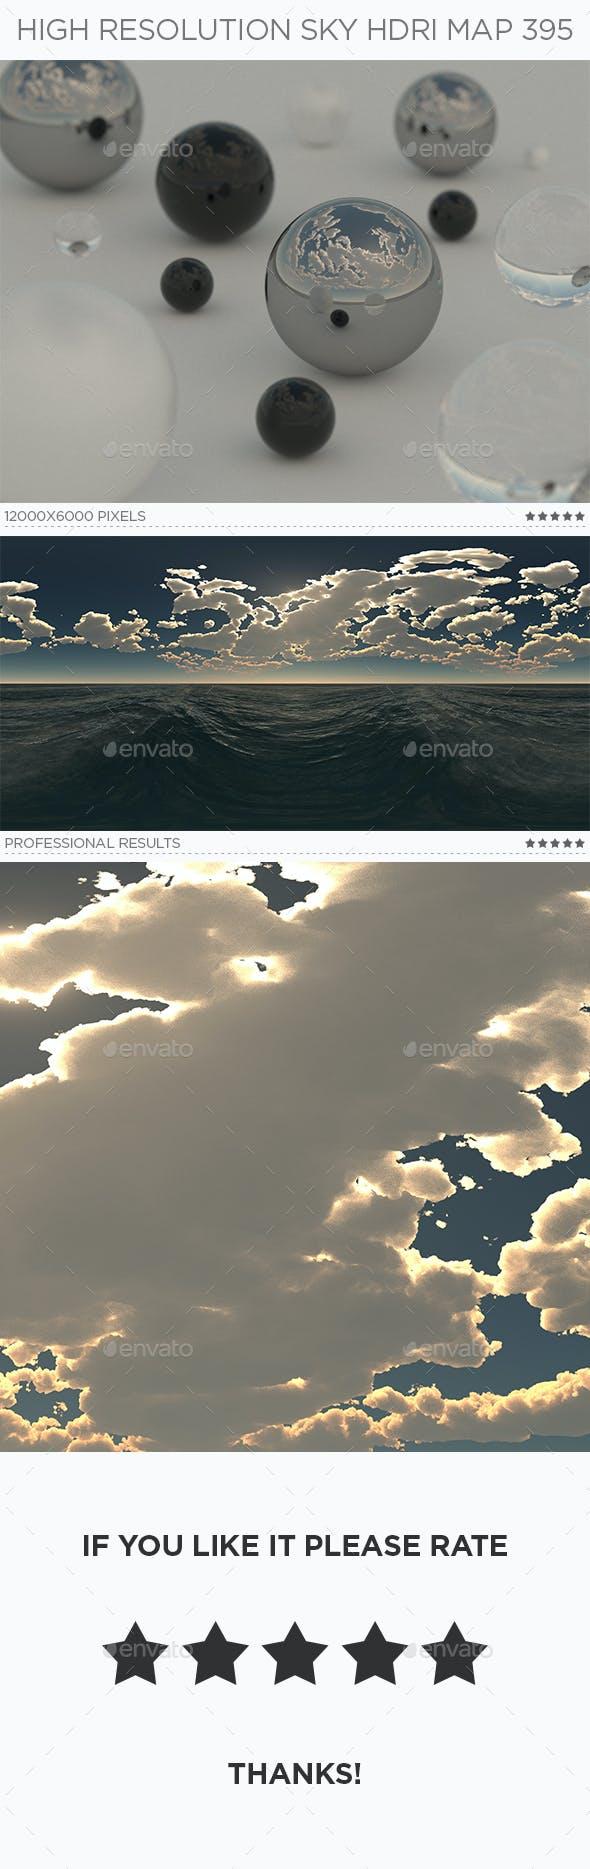 High Resolution Sky HDRi Map 395 - 3DOcean Item for Sale